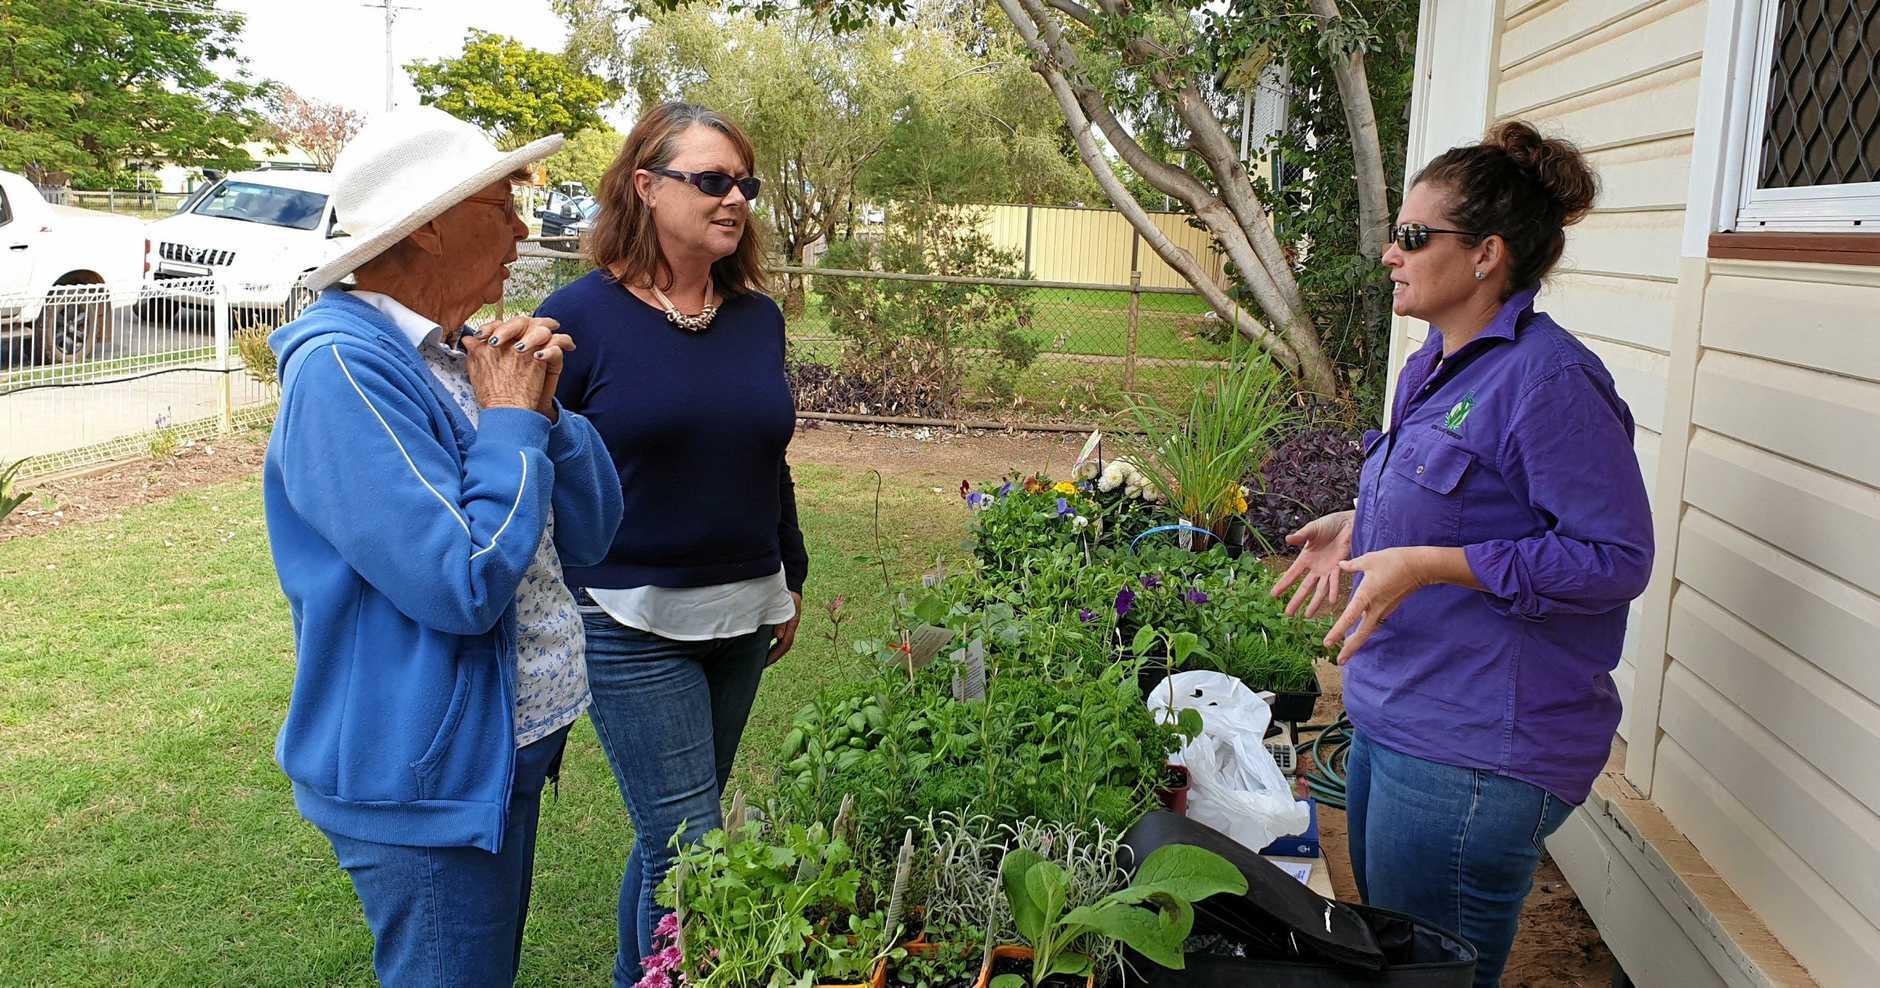 COUNTRY WOMEN: Jan Aldridge sharing some gardening tips during Friendship Day.